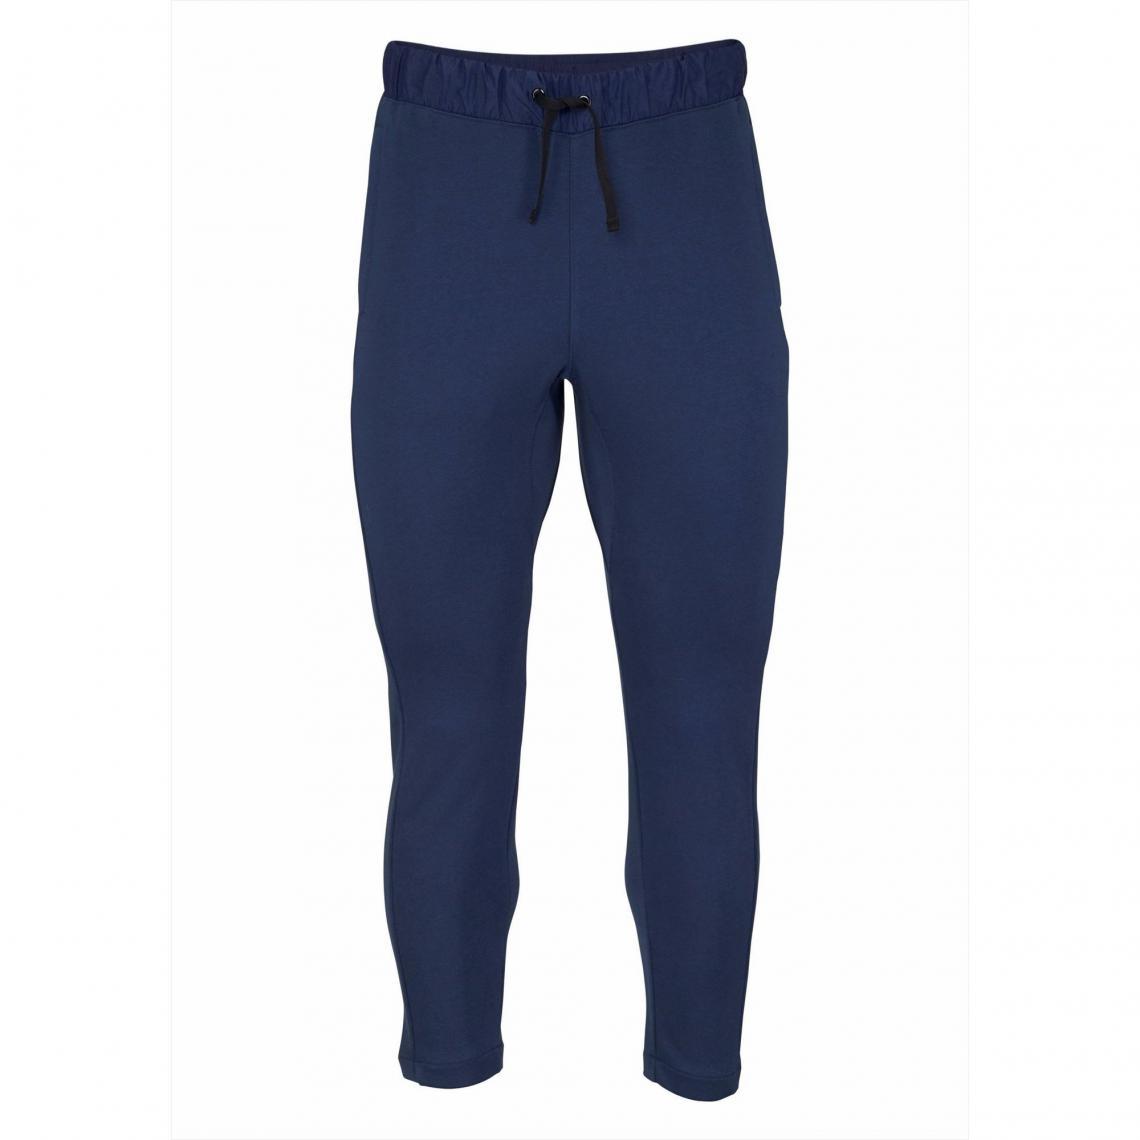 Nike de Pantalon homme survêtement Bleu Nike TXwpXq